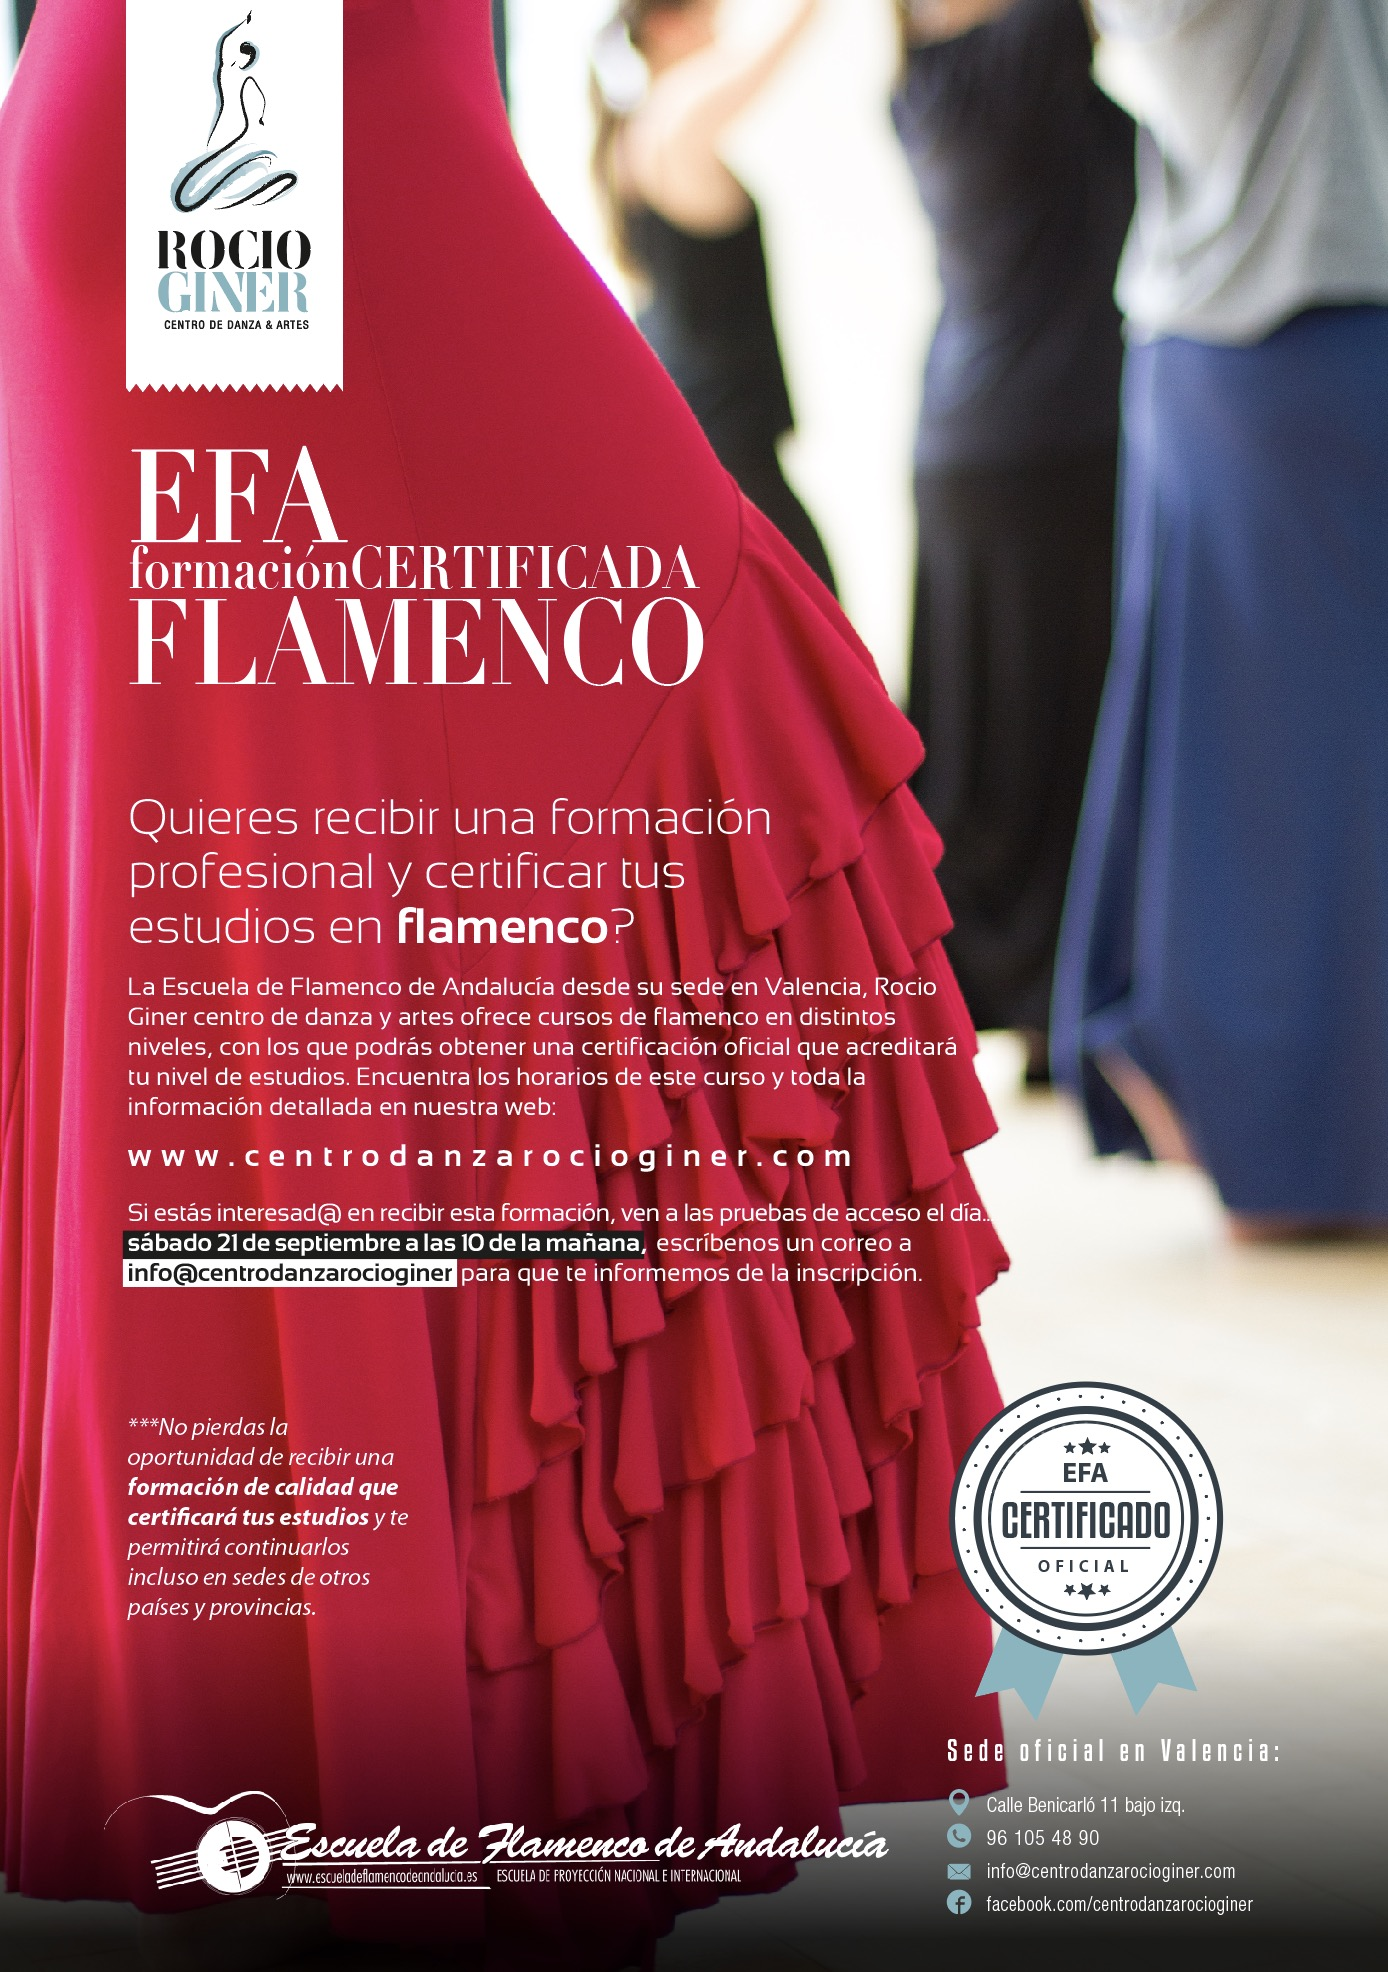 Flamenco EFA en Valencia